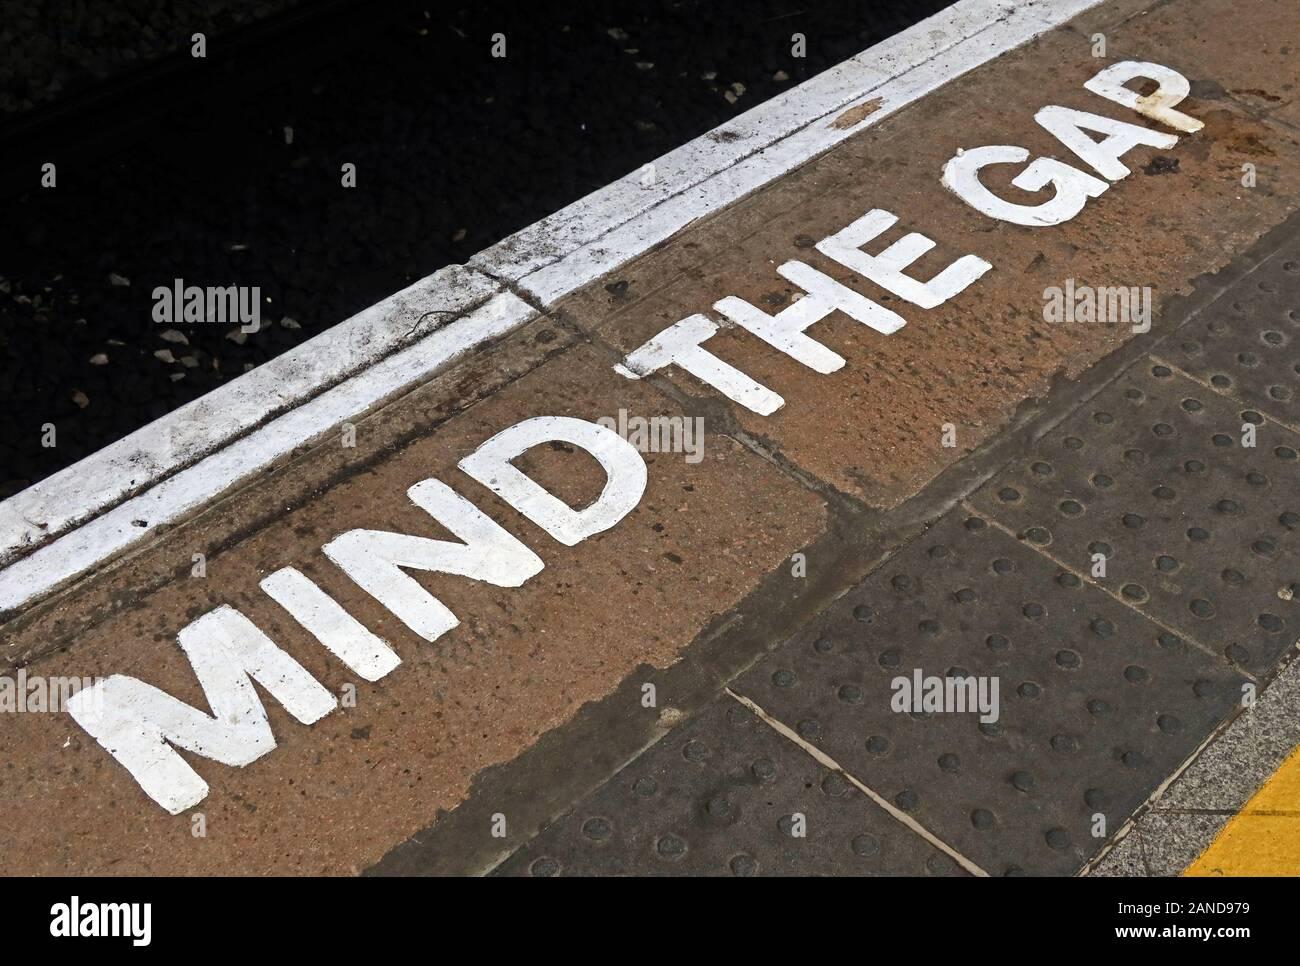 Mind The Gap, MindTheGap sign, railway station platform, England, UK Stock Photo